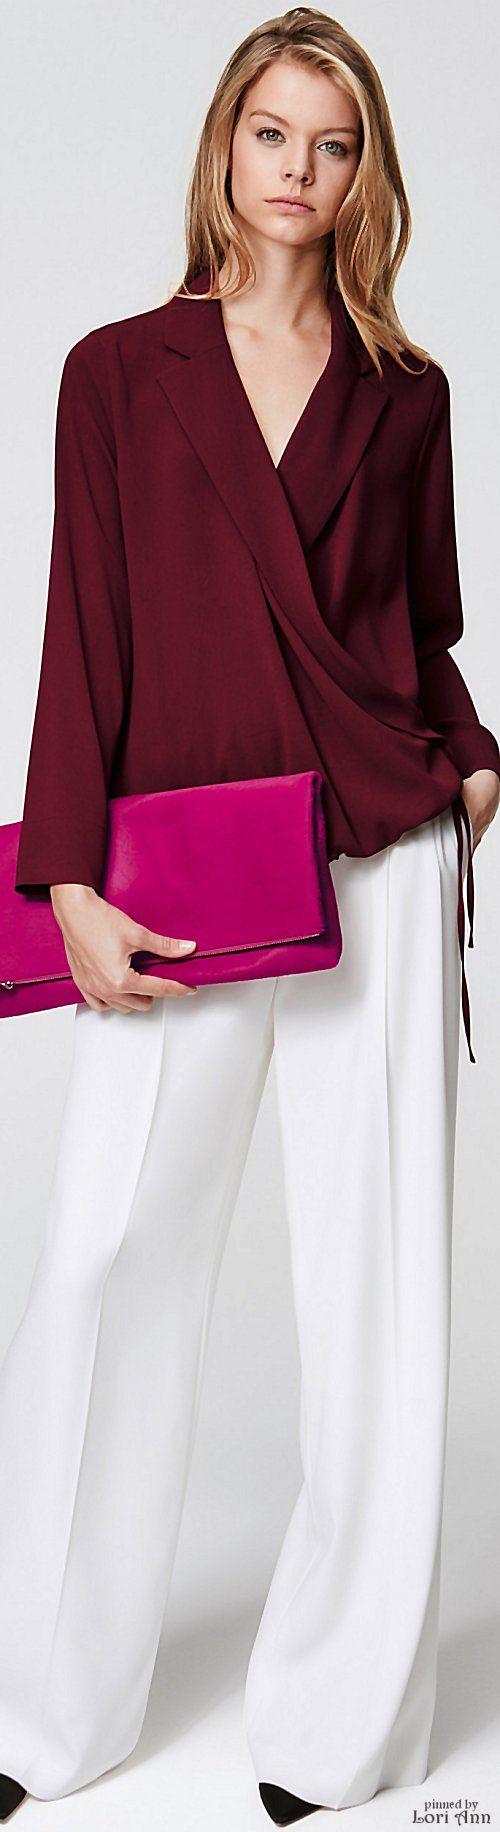 Escada Pre-Fall 2016 women fashion outfit clothing style apparel @roressclothes closet ideas